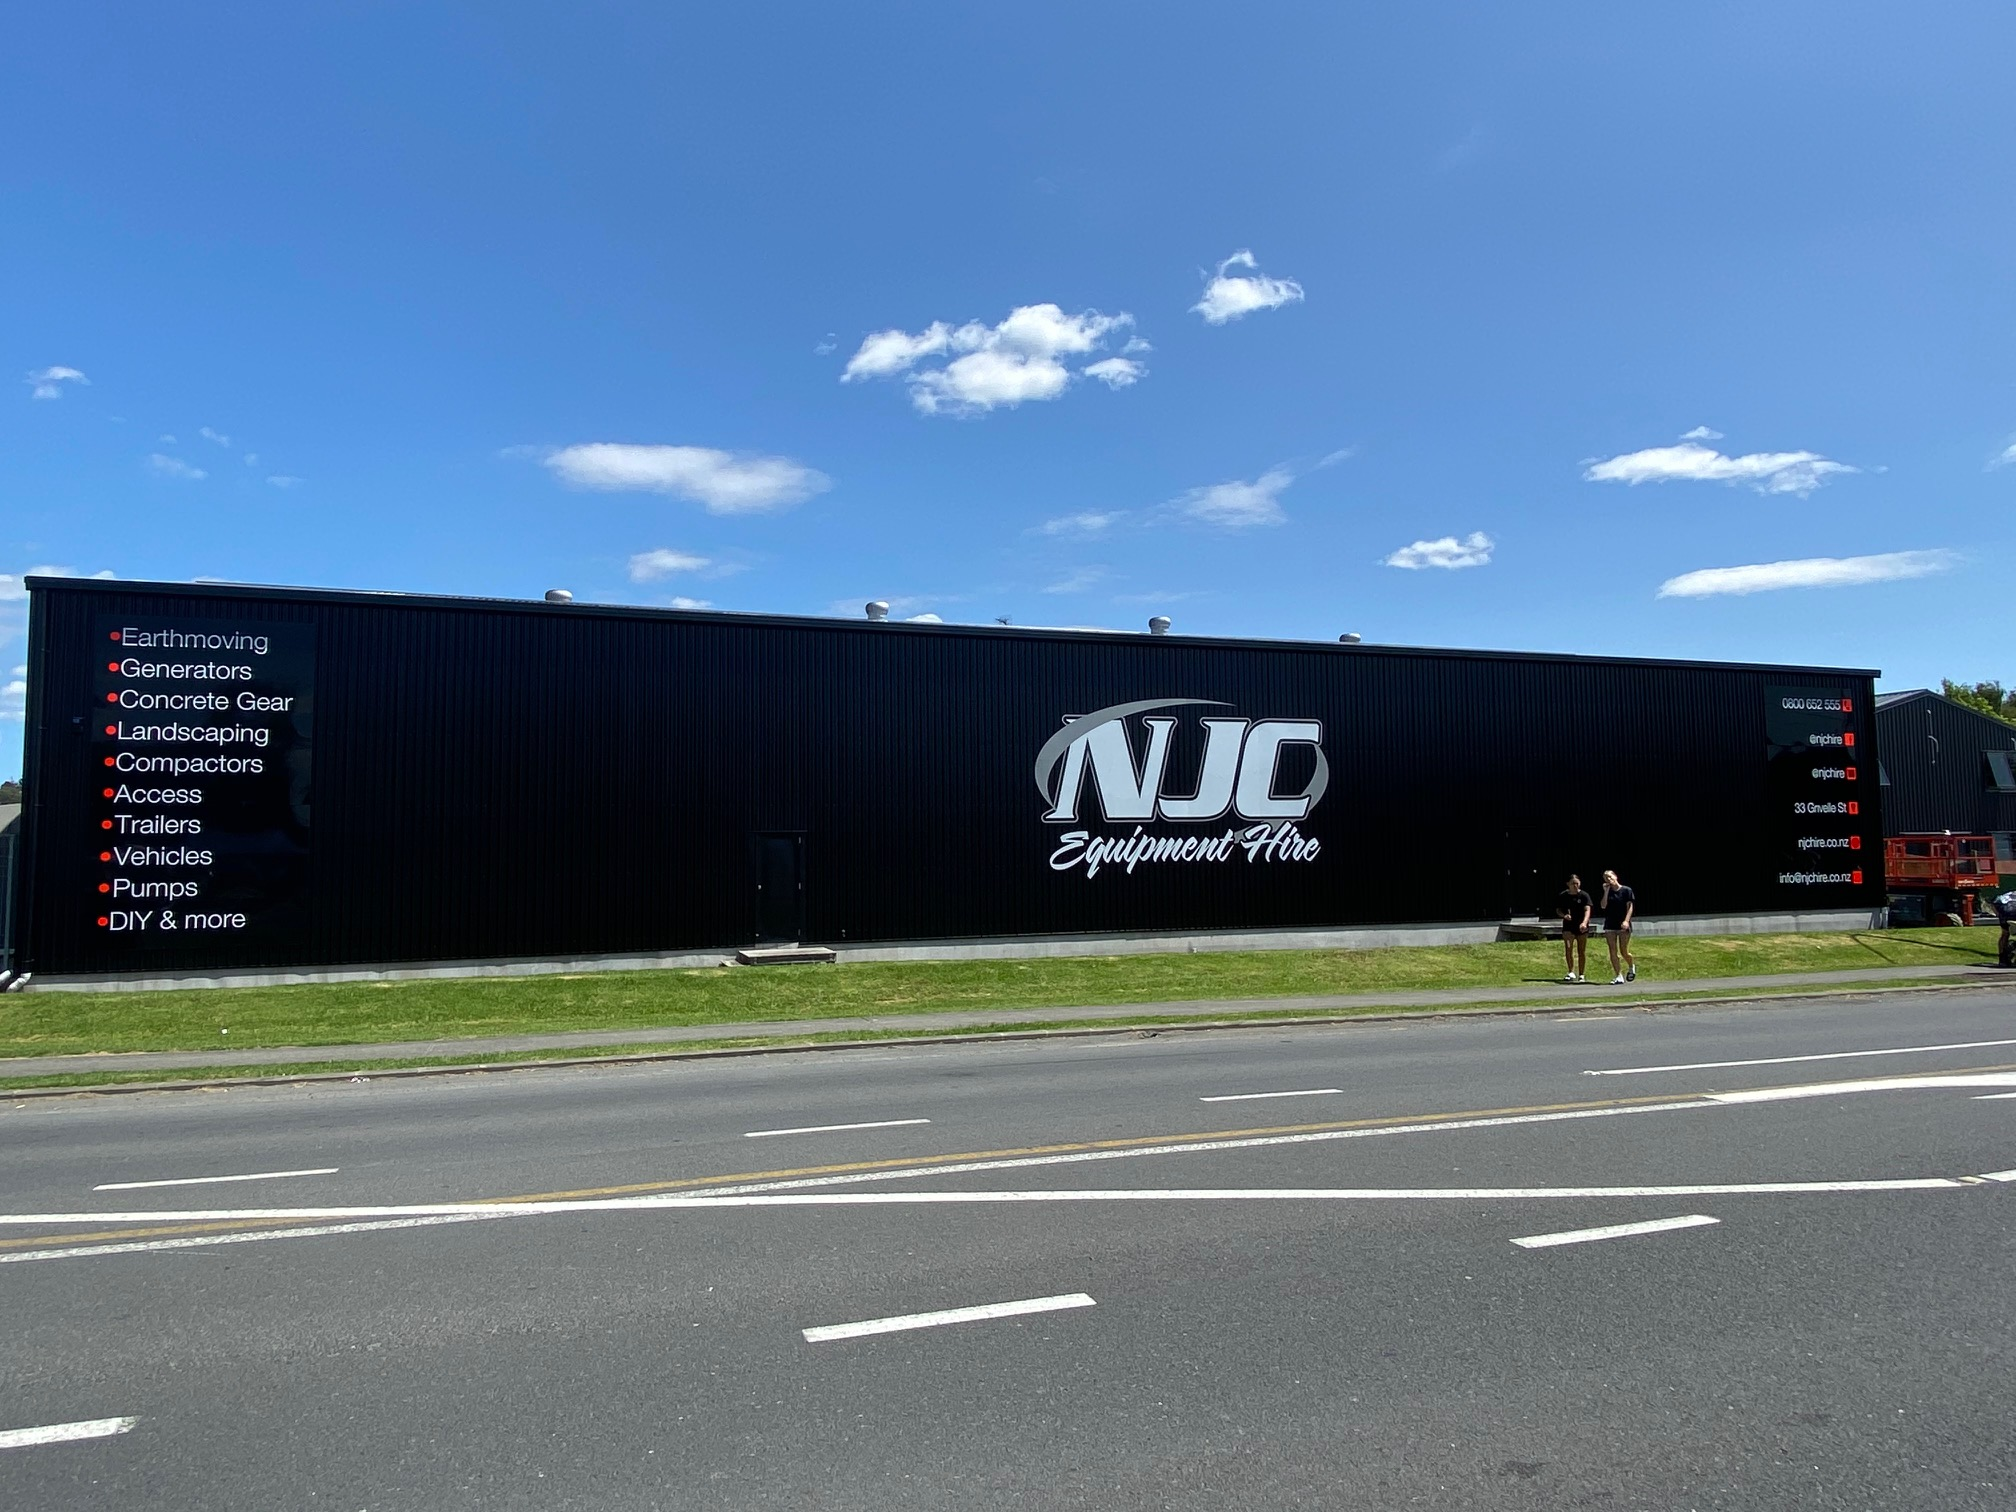 NJC Equipment Hire Building